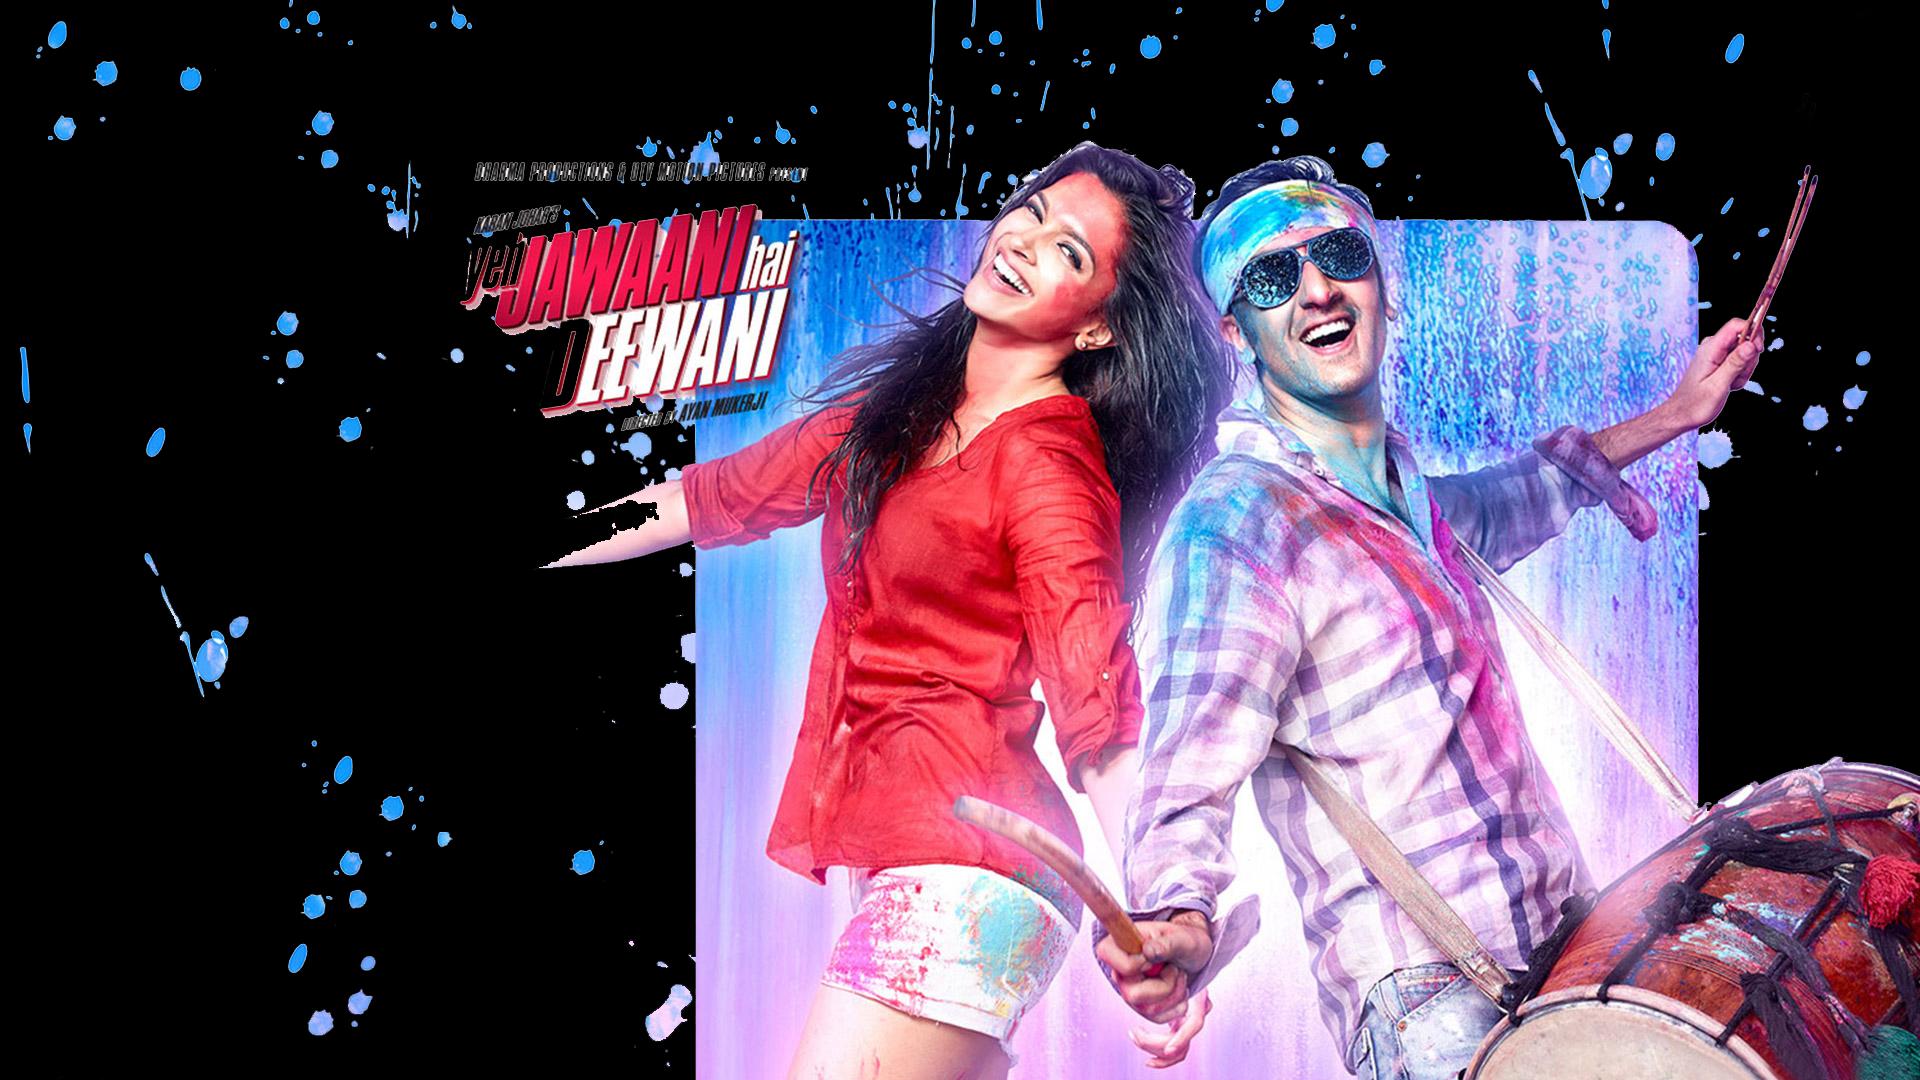 Yeh Jawaani Hai Dewaani Wallpaper Movie